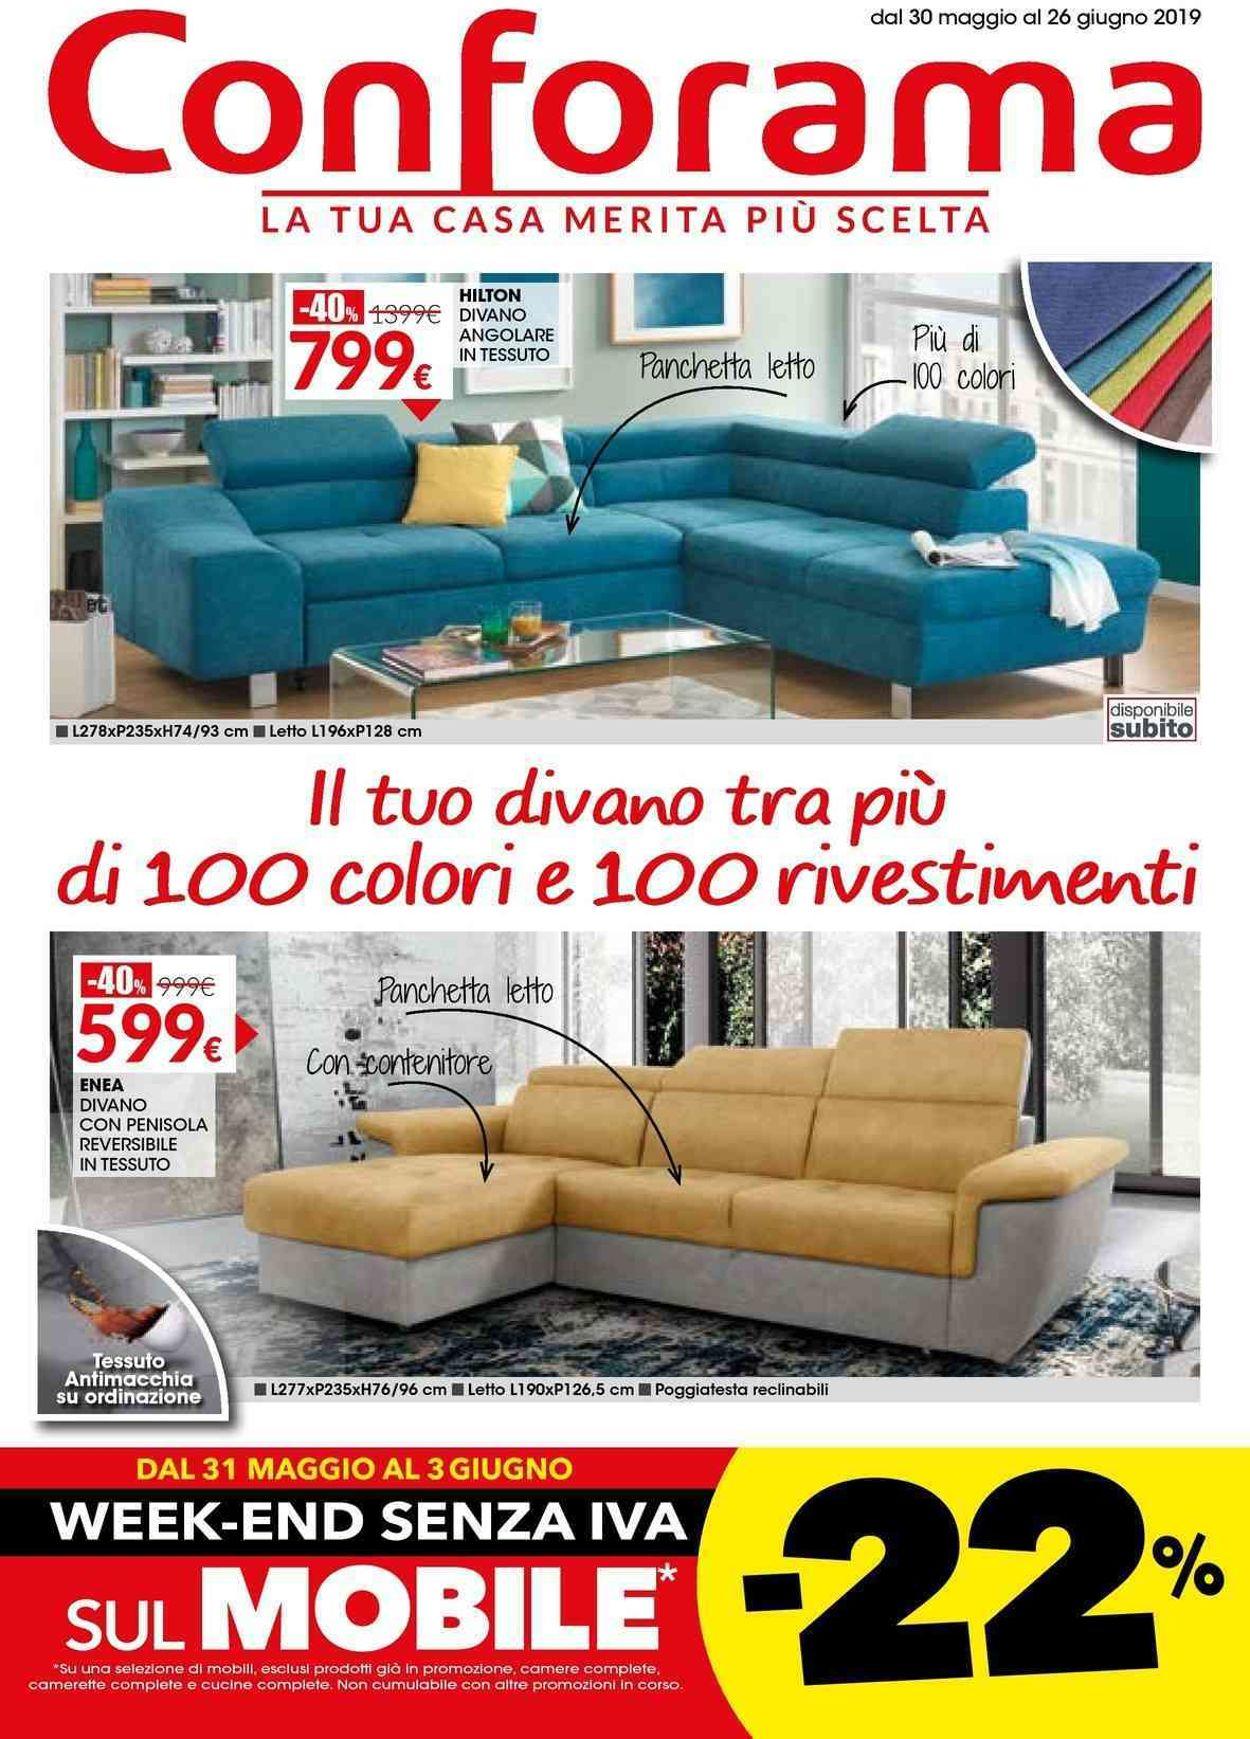 Volantino Conforama - Offerte 30/05-26/06/2019